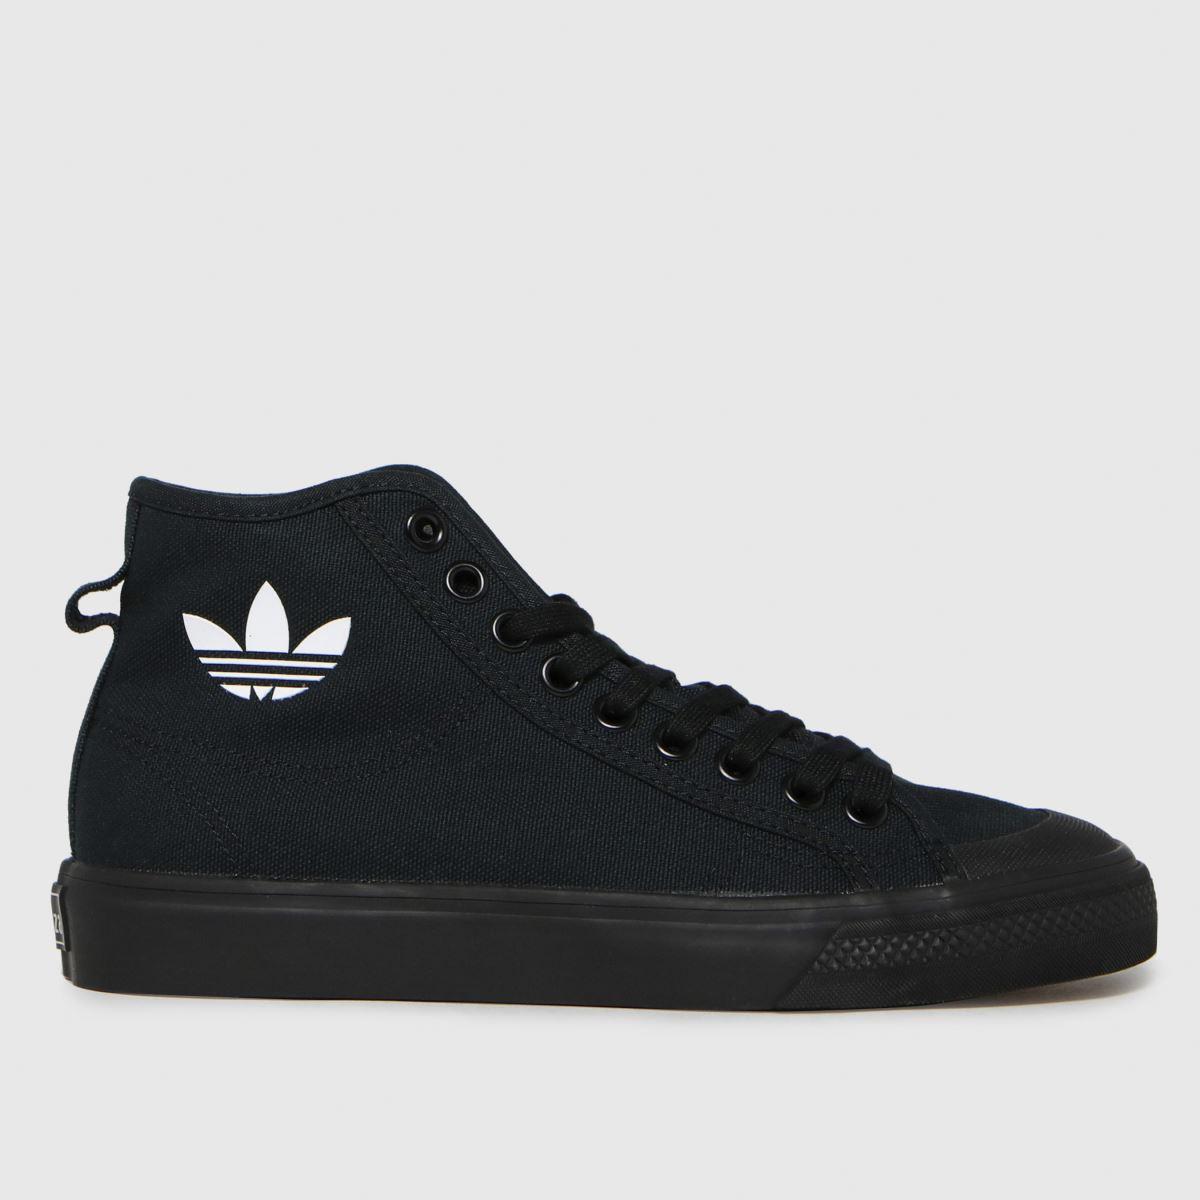 Adidas Black & White Nizza Hi Trainers